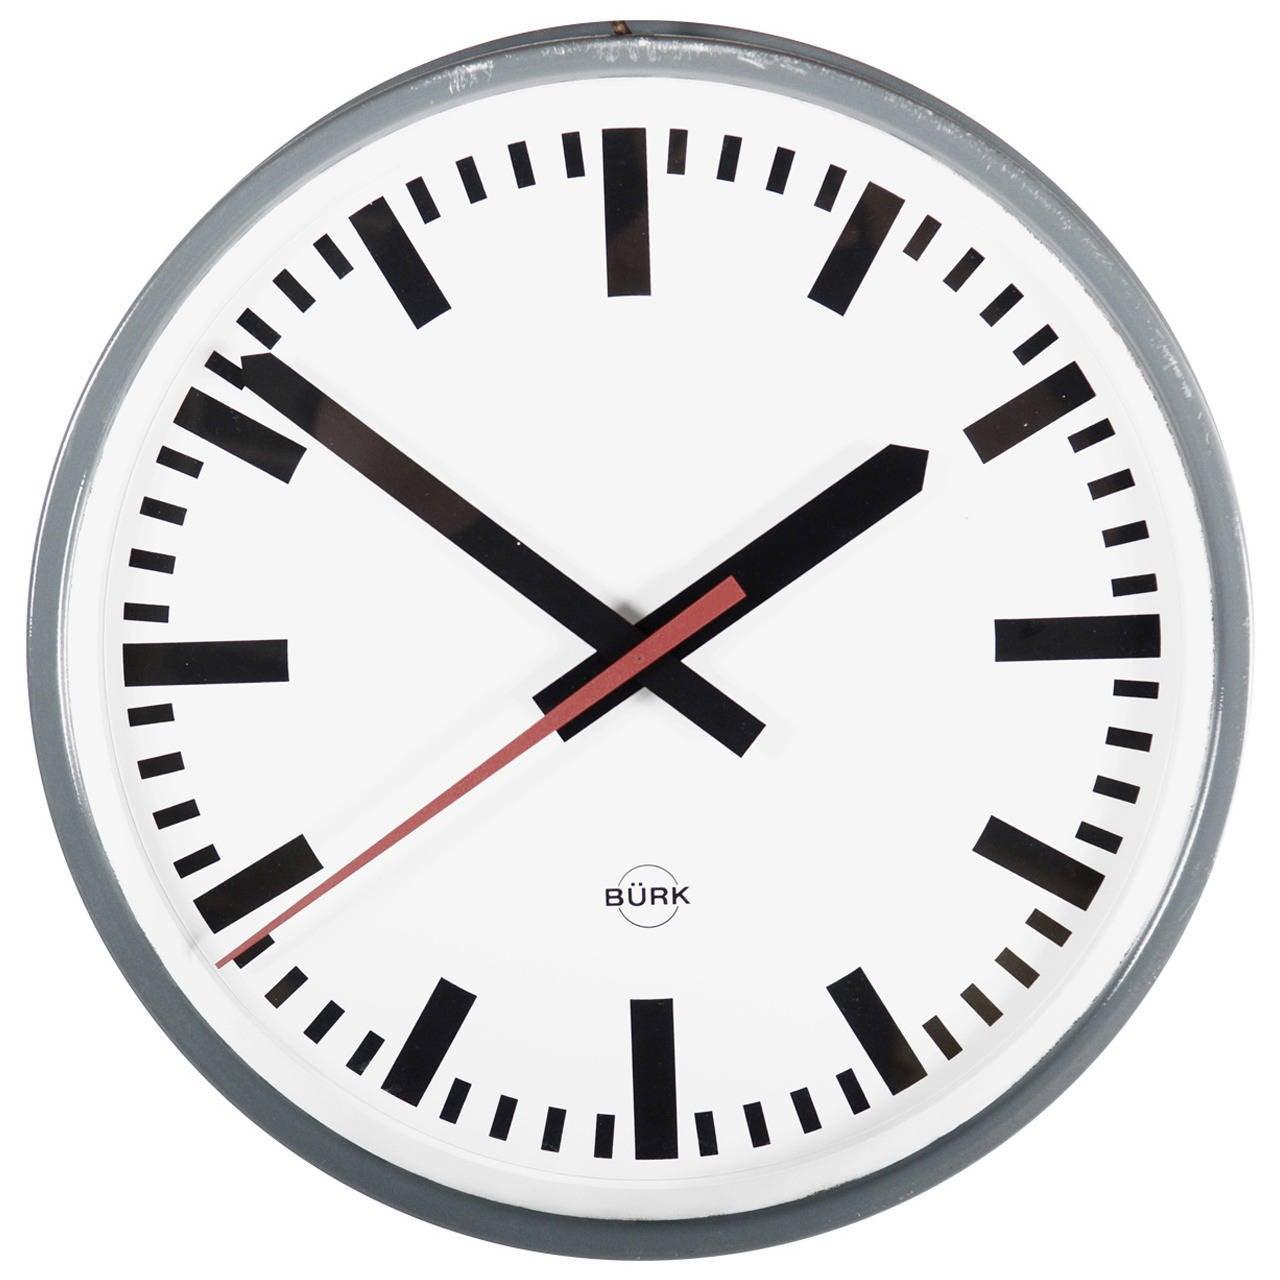 Large German Industrial Clock, Labeled Bürk